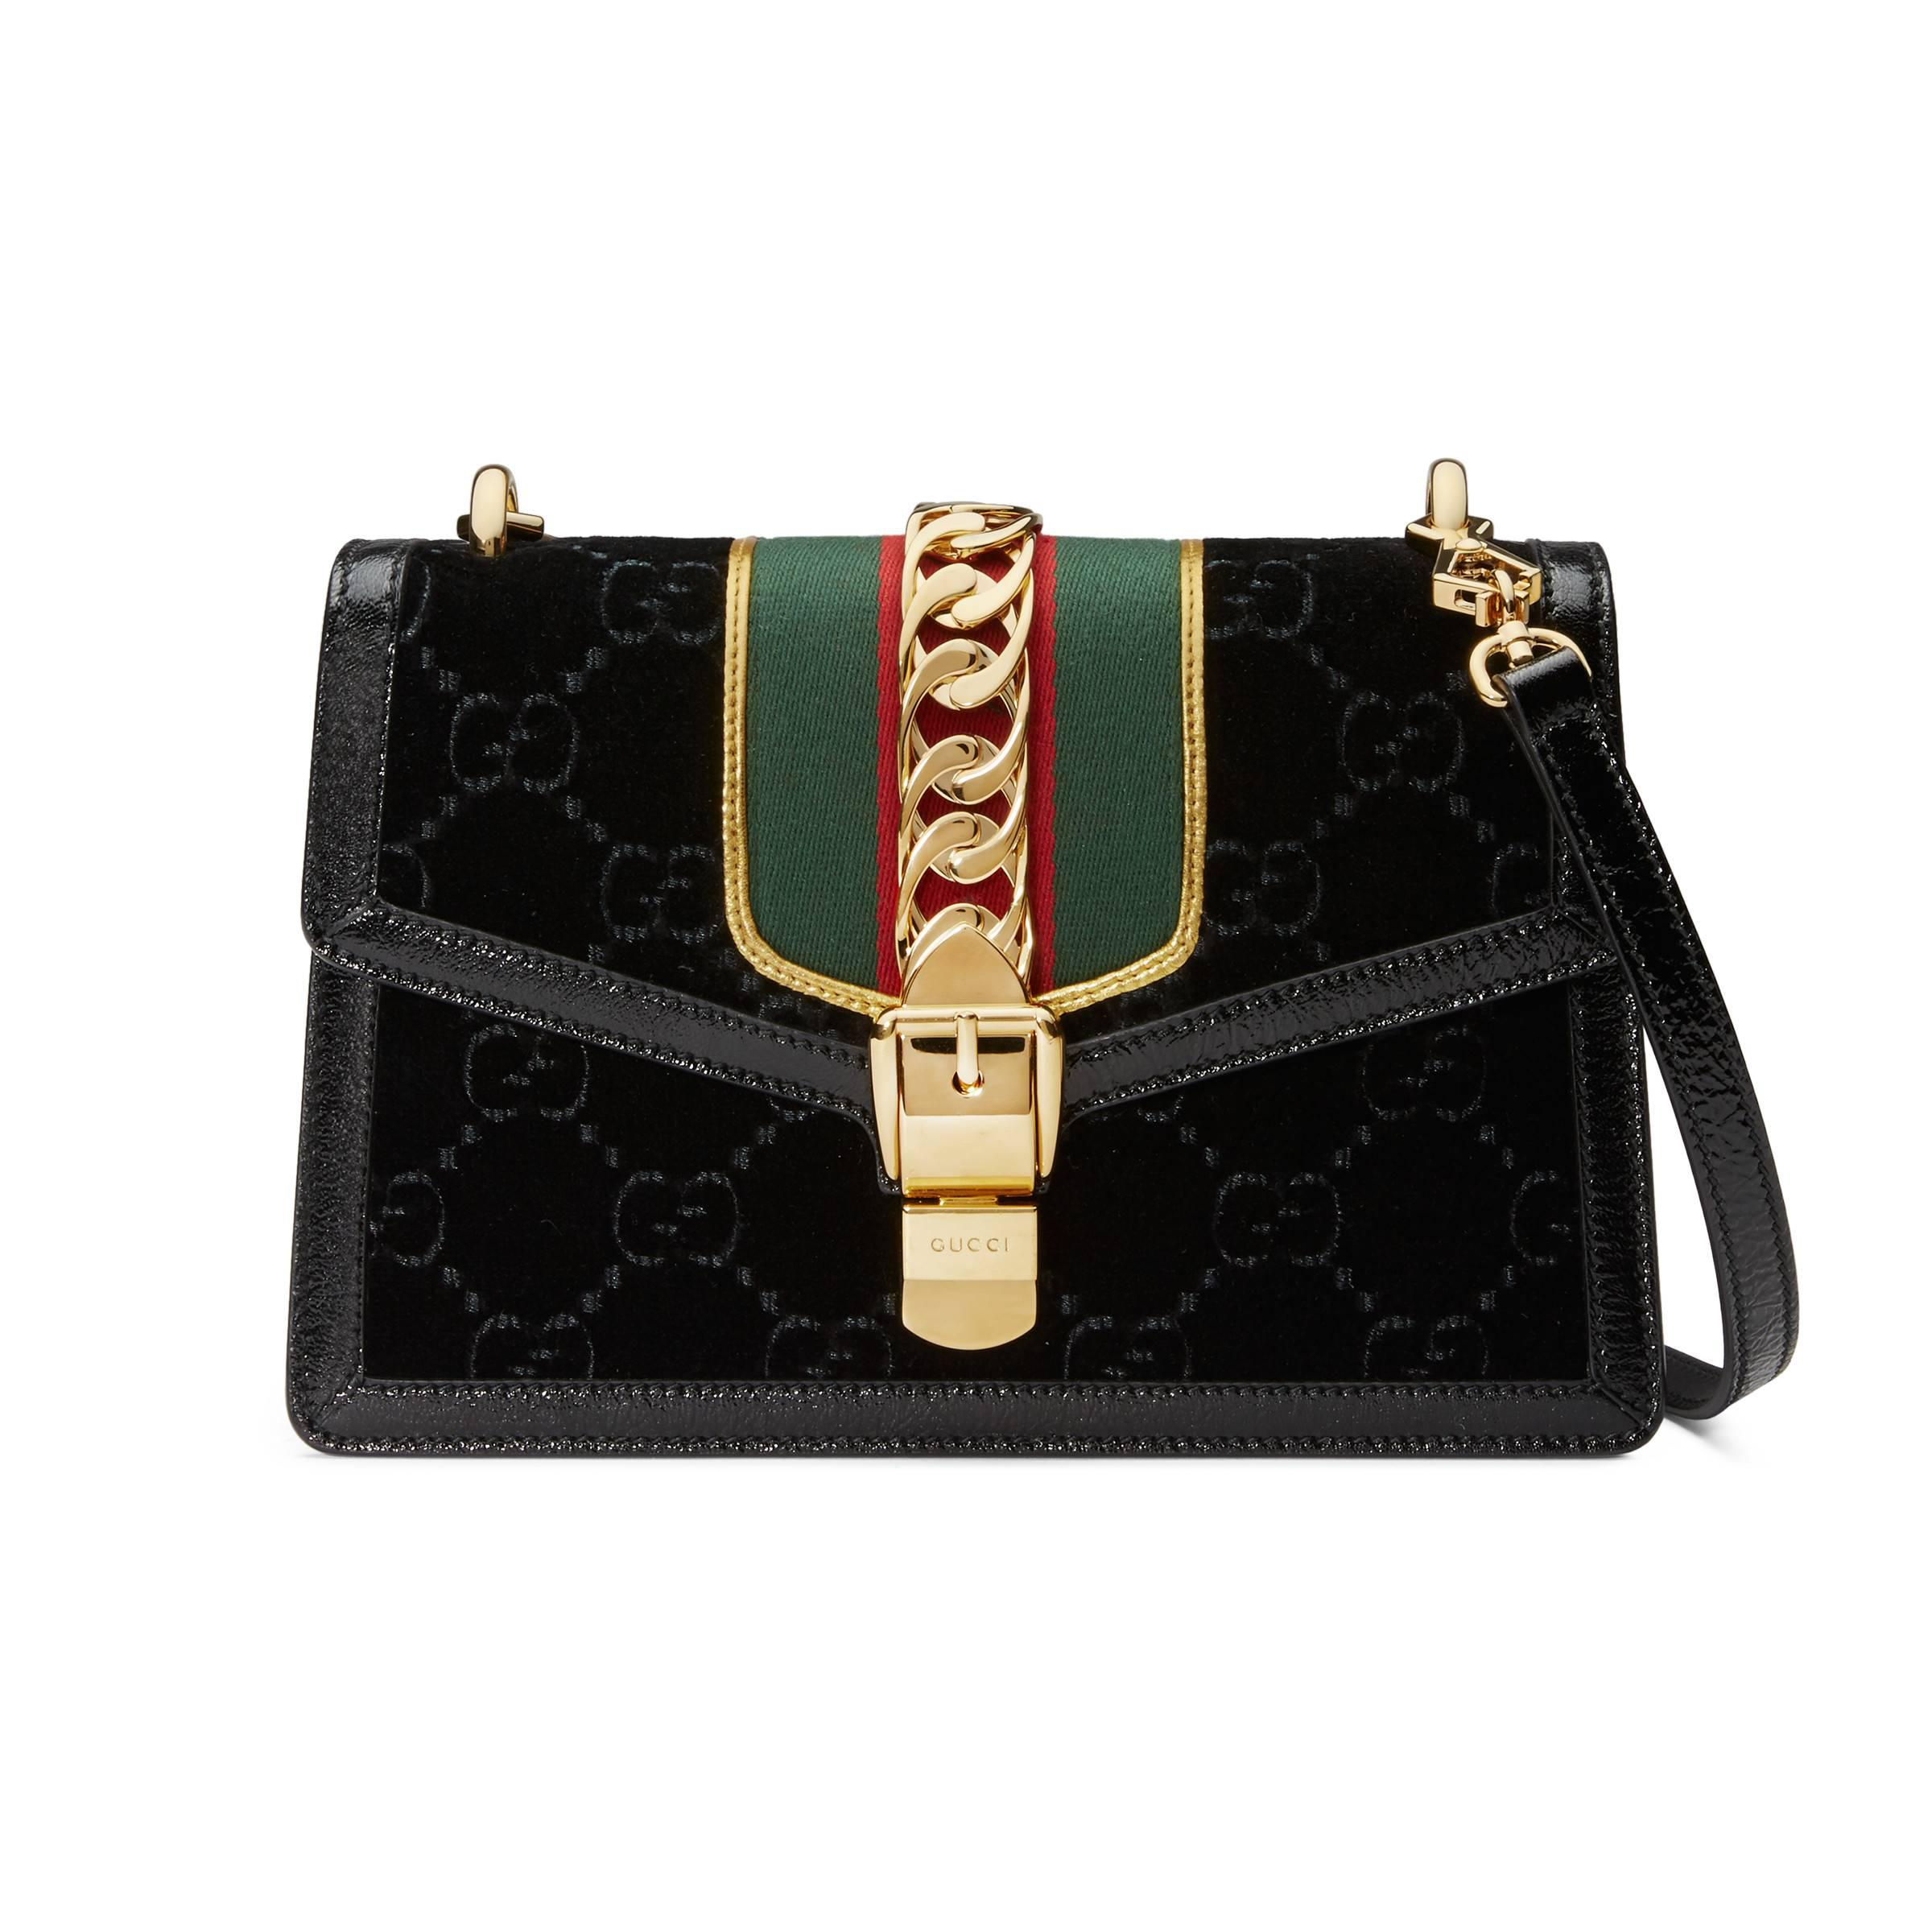 98e8d0a49 Gucci - Black Sylvie GG Velvet Small Shoulder Bag - Lyst. View fullscreen